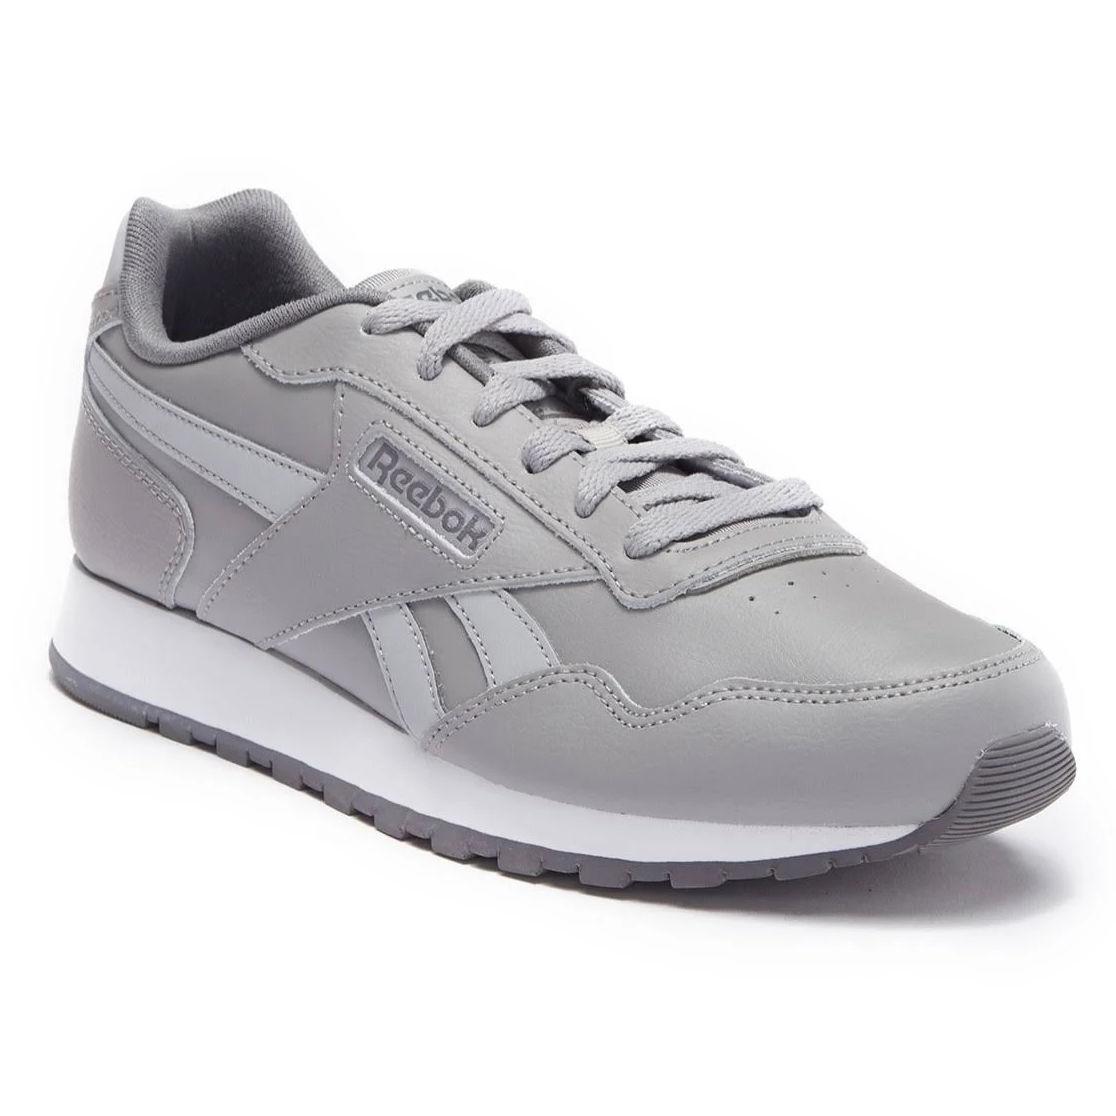 Reebok Men's Classic Harman Running Shoes, White/gum